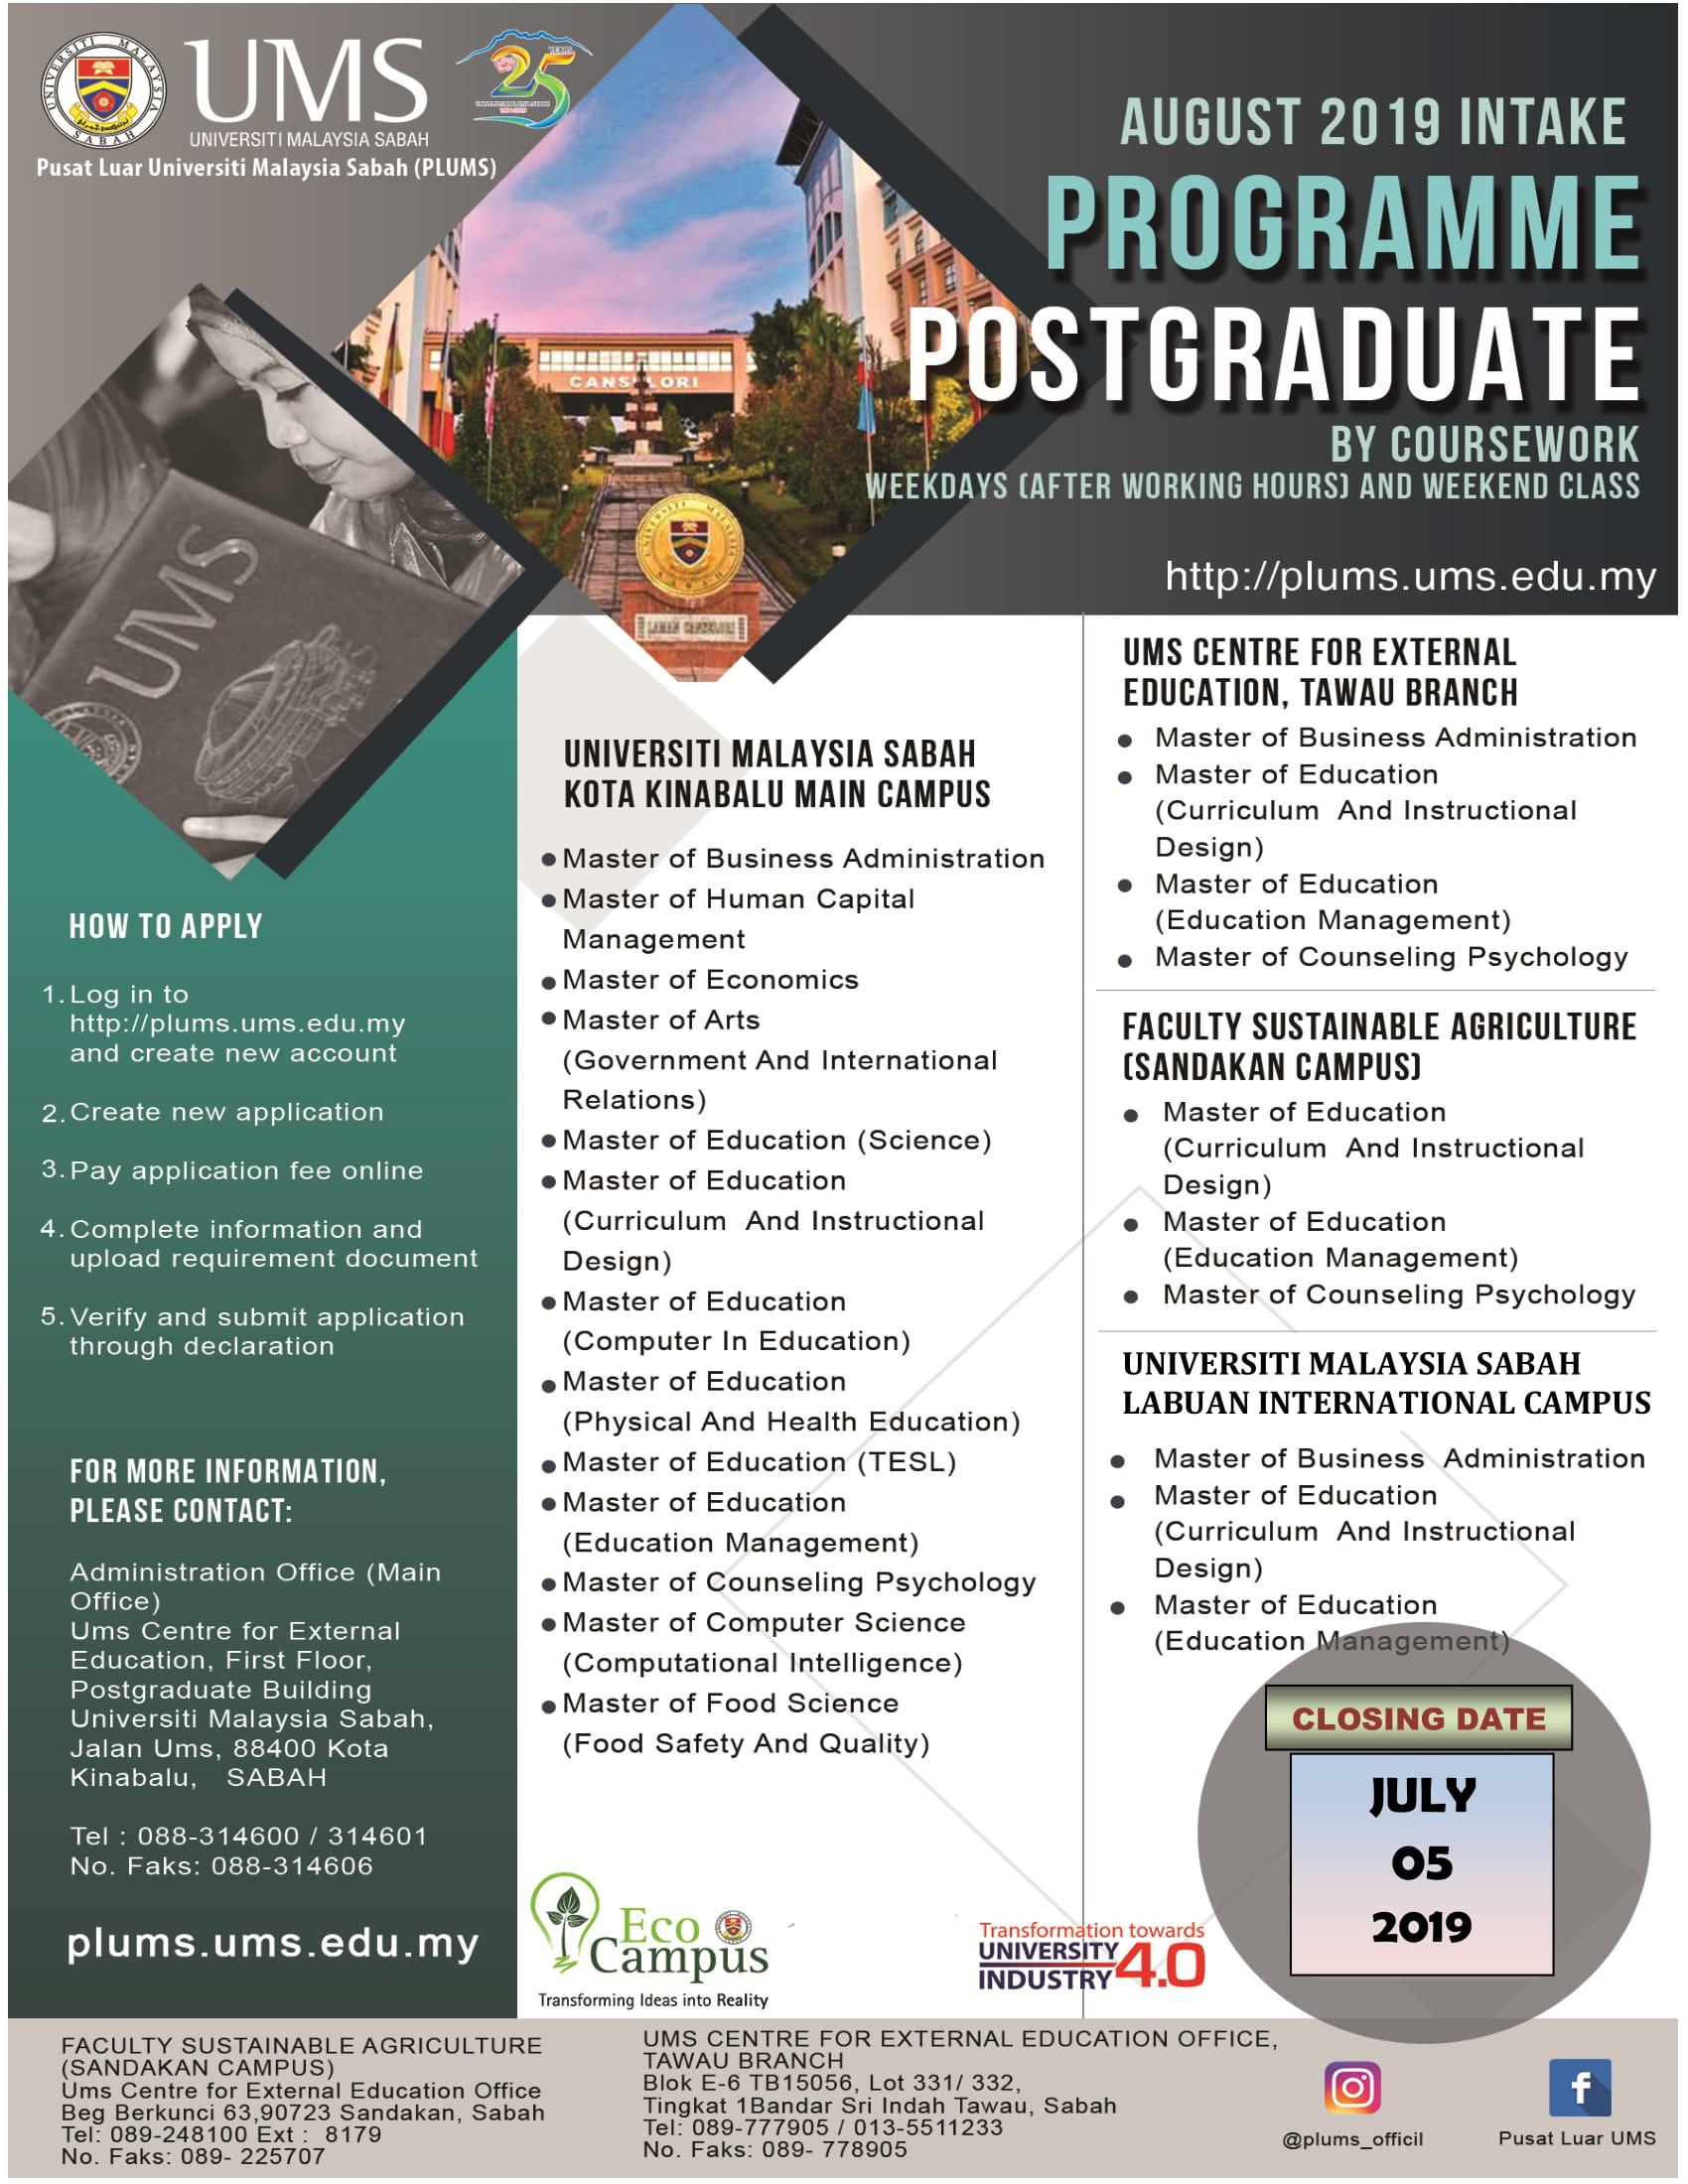 ums postgraduate coursework